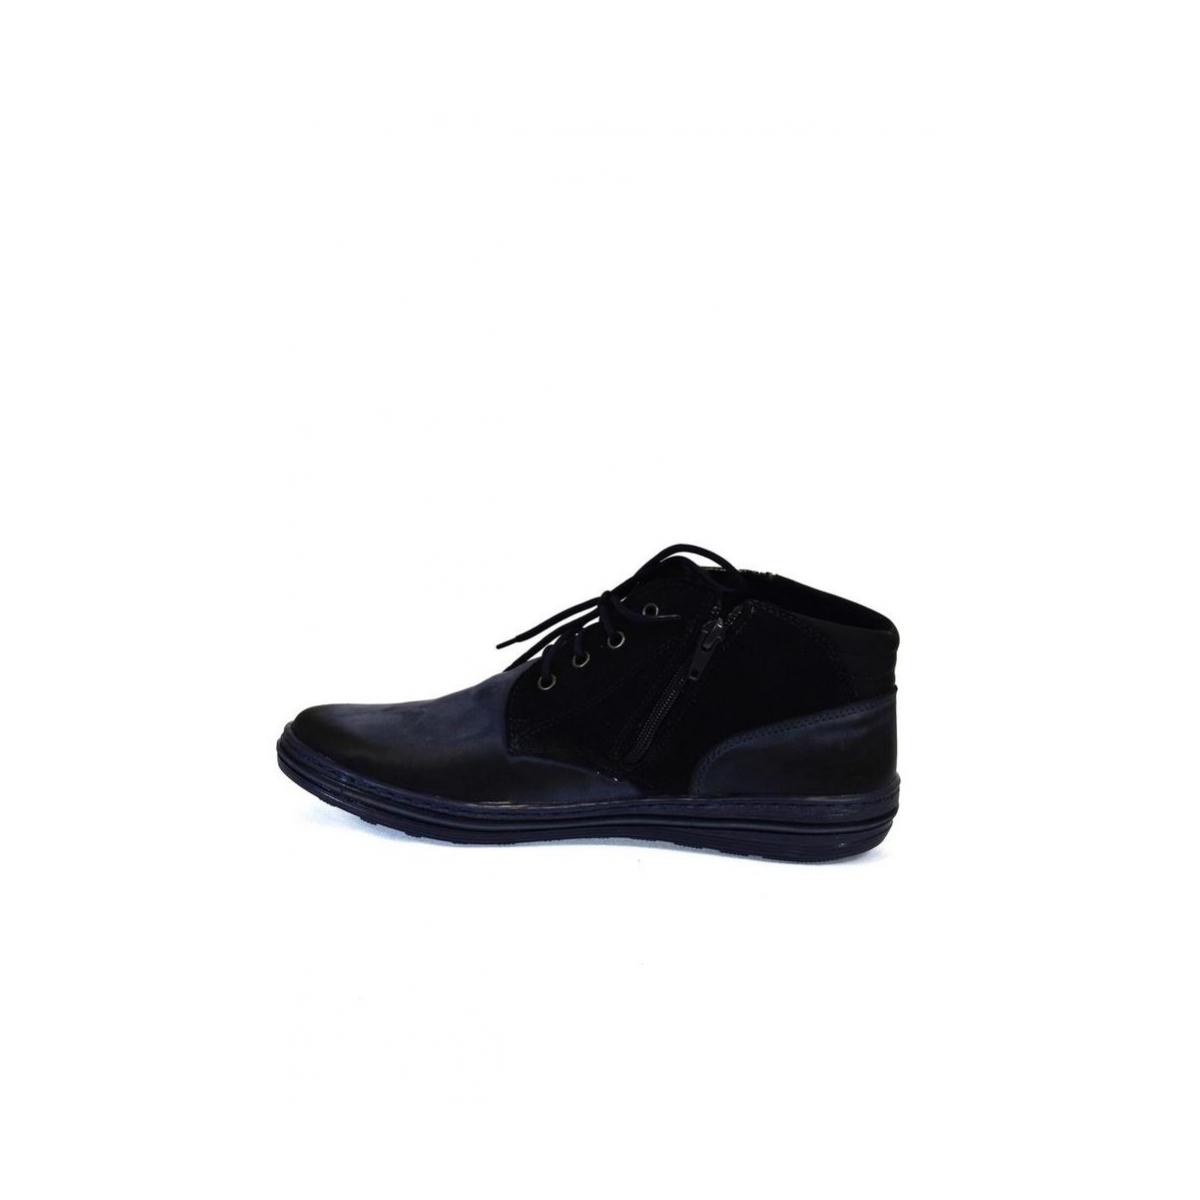 01a20dbb57 Pánske kožené modré zimné topánky IZIDOR - 6